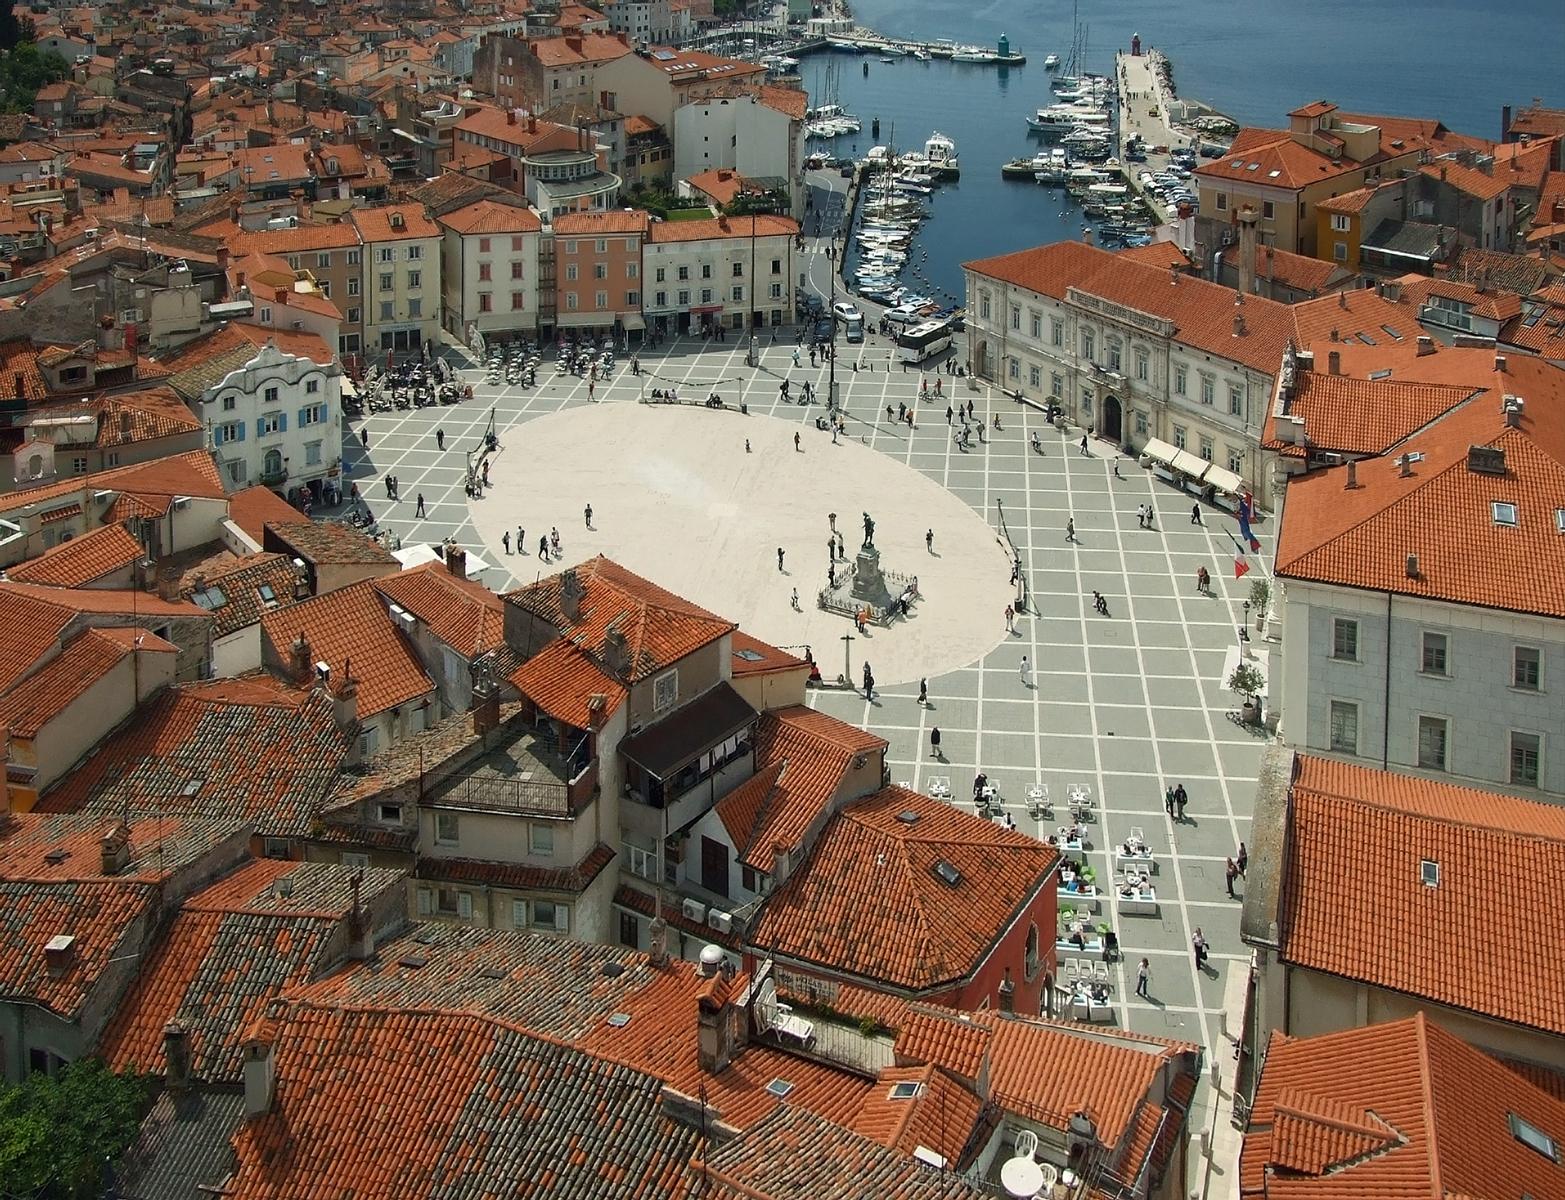 Tartini_Square_from_above,_Piran,_May_2009